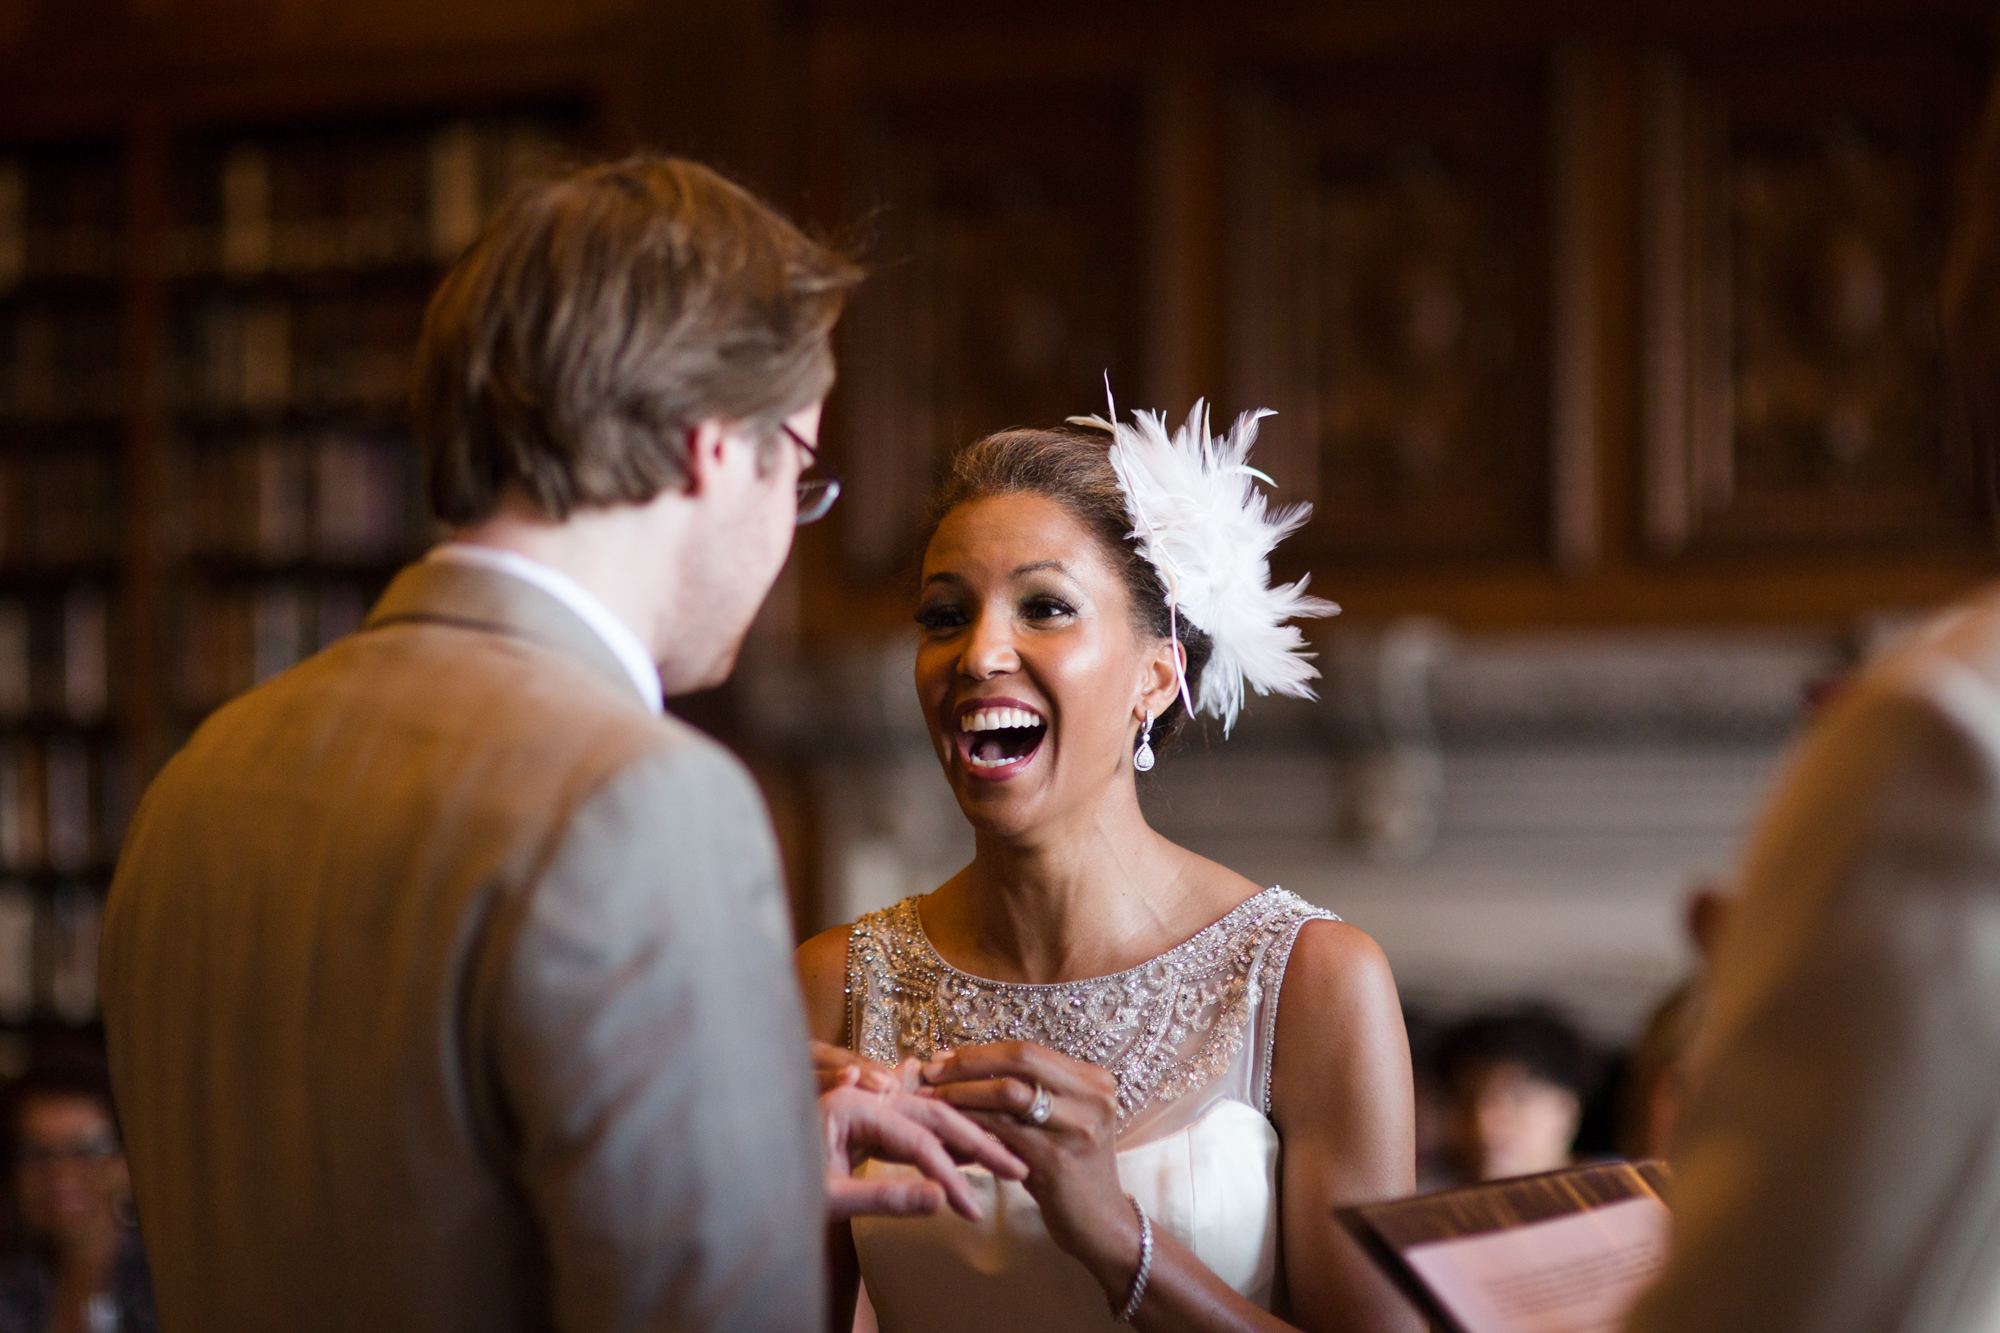 Documentary wedding photography at University Club of Chicago